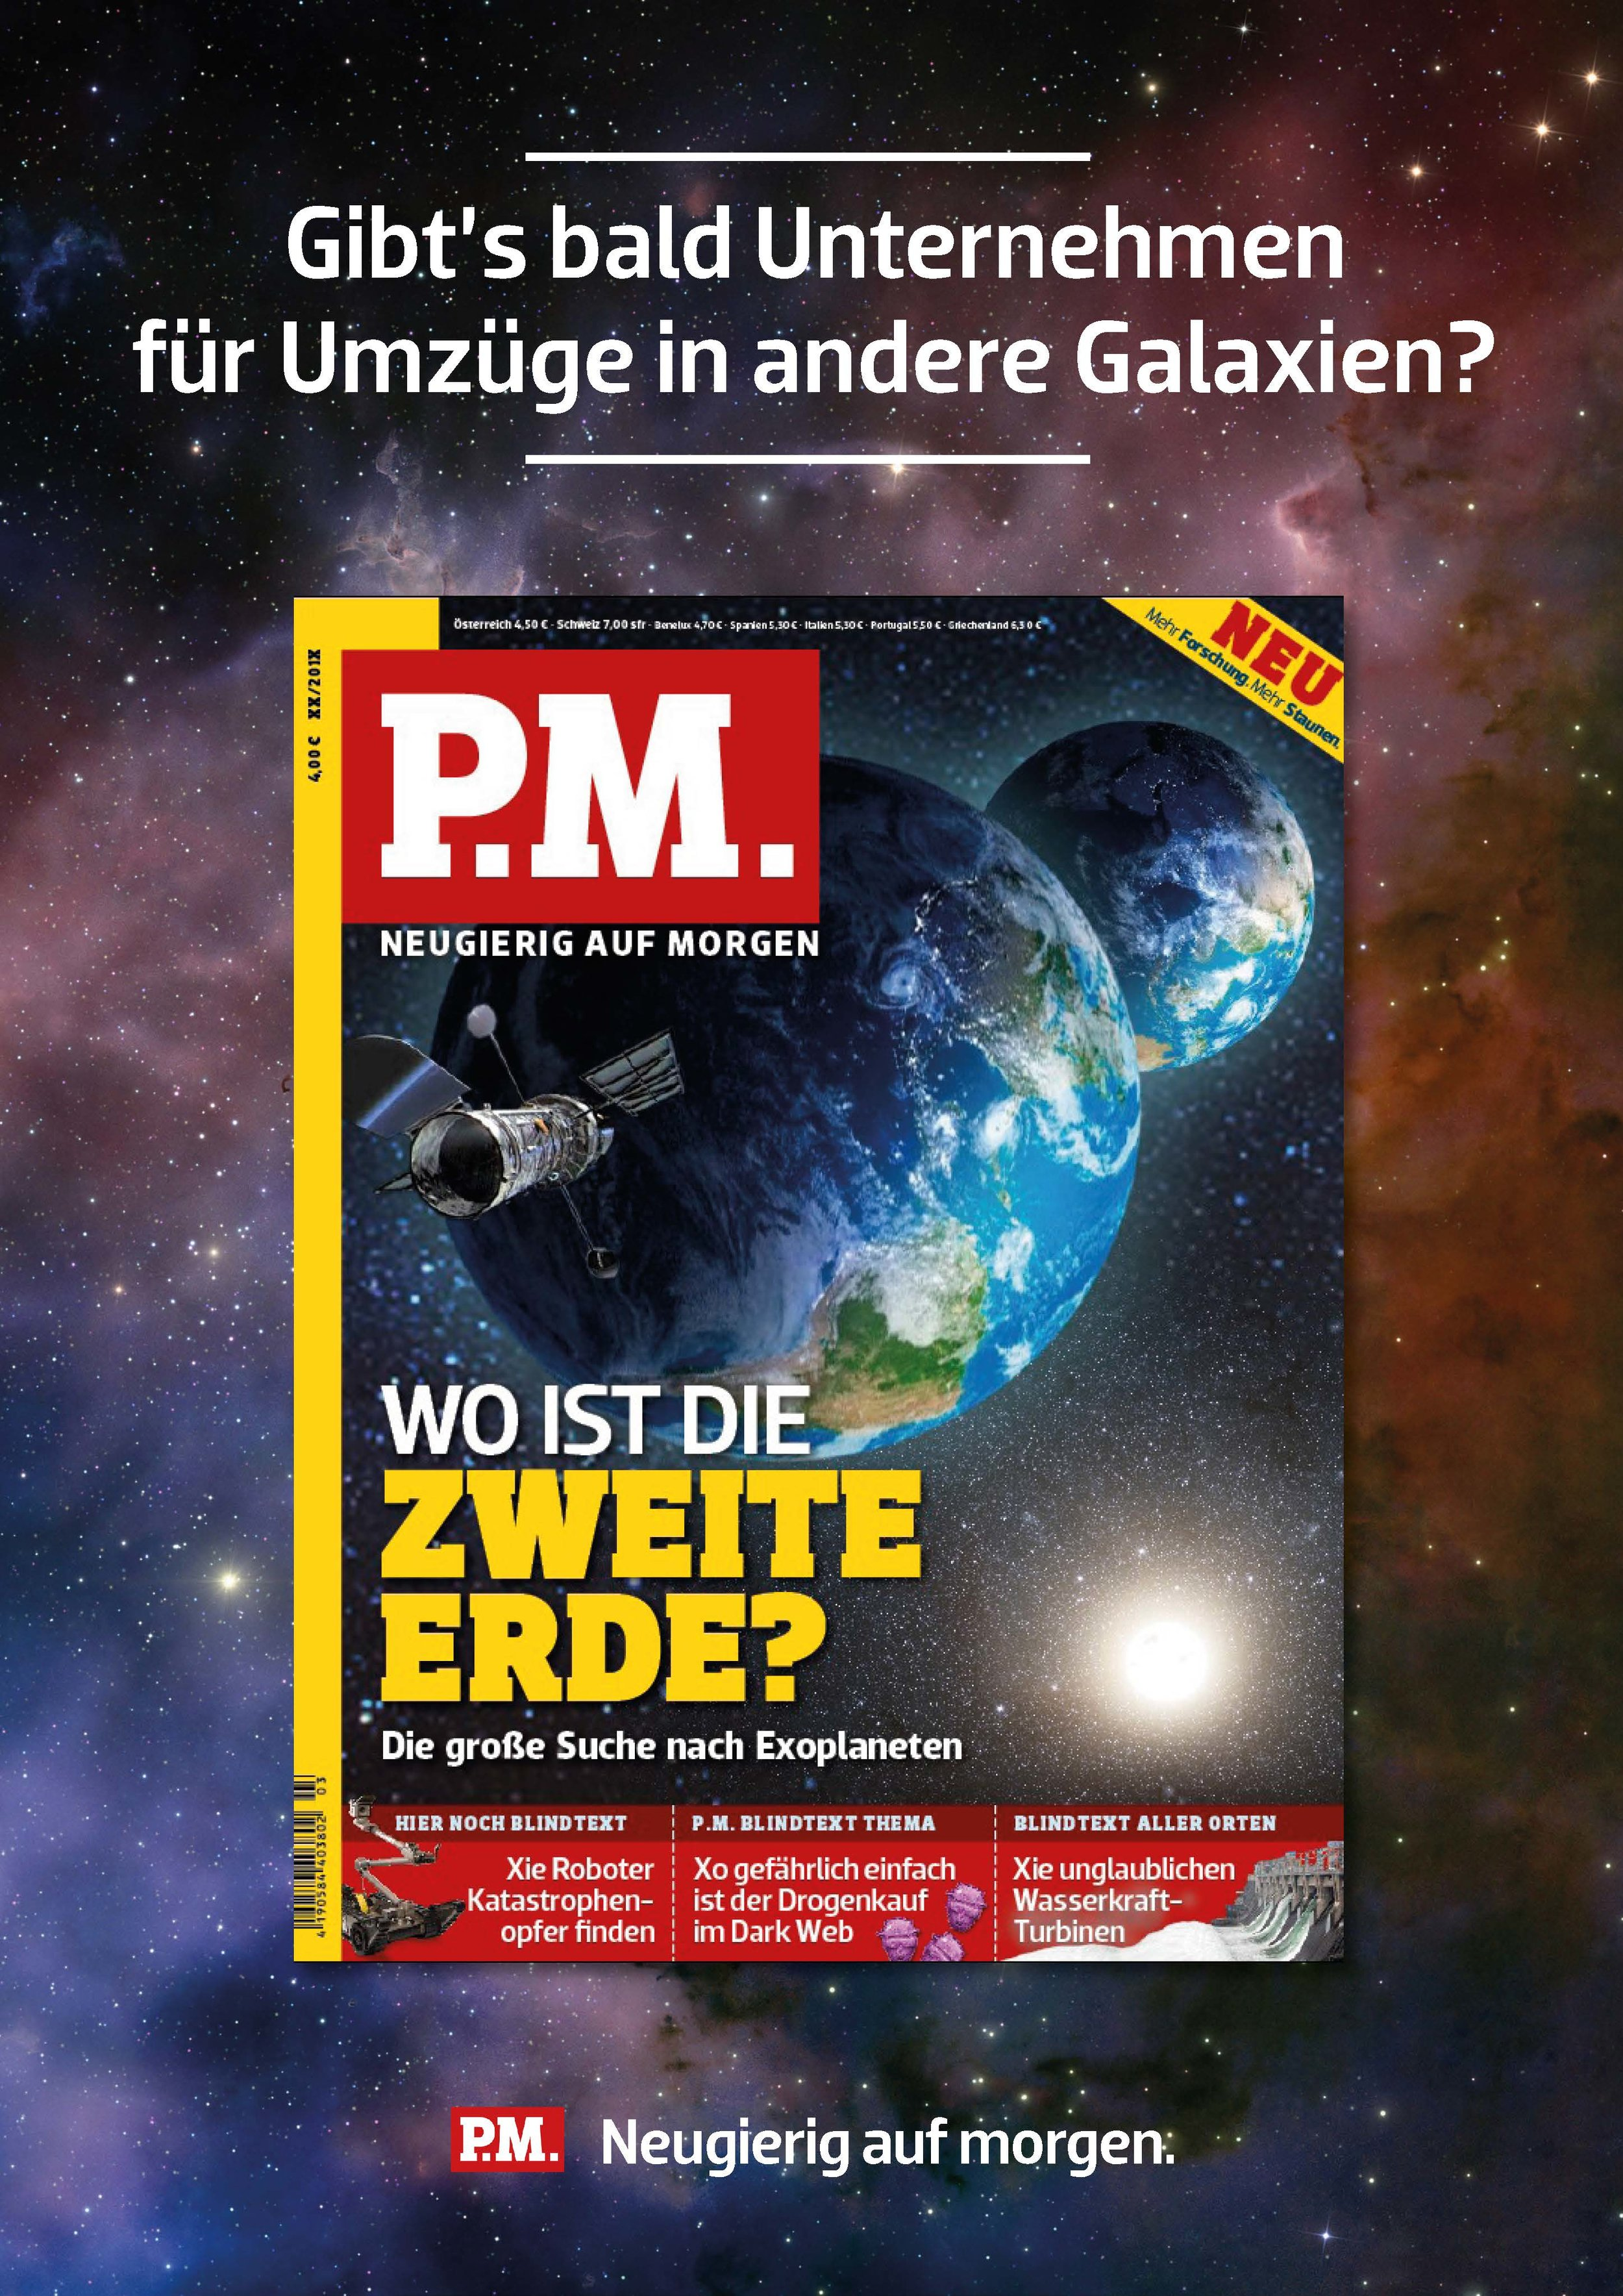 PM_Kosmos_1012.jpg